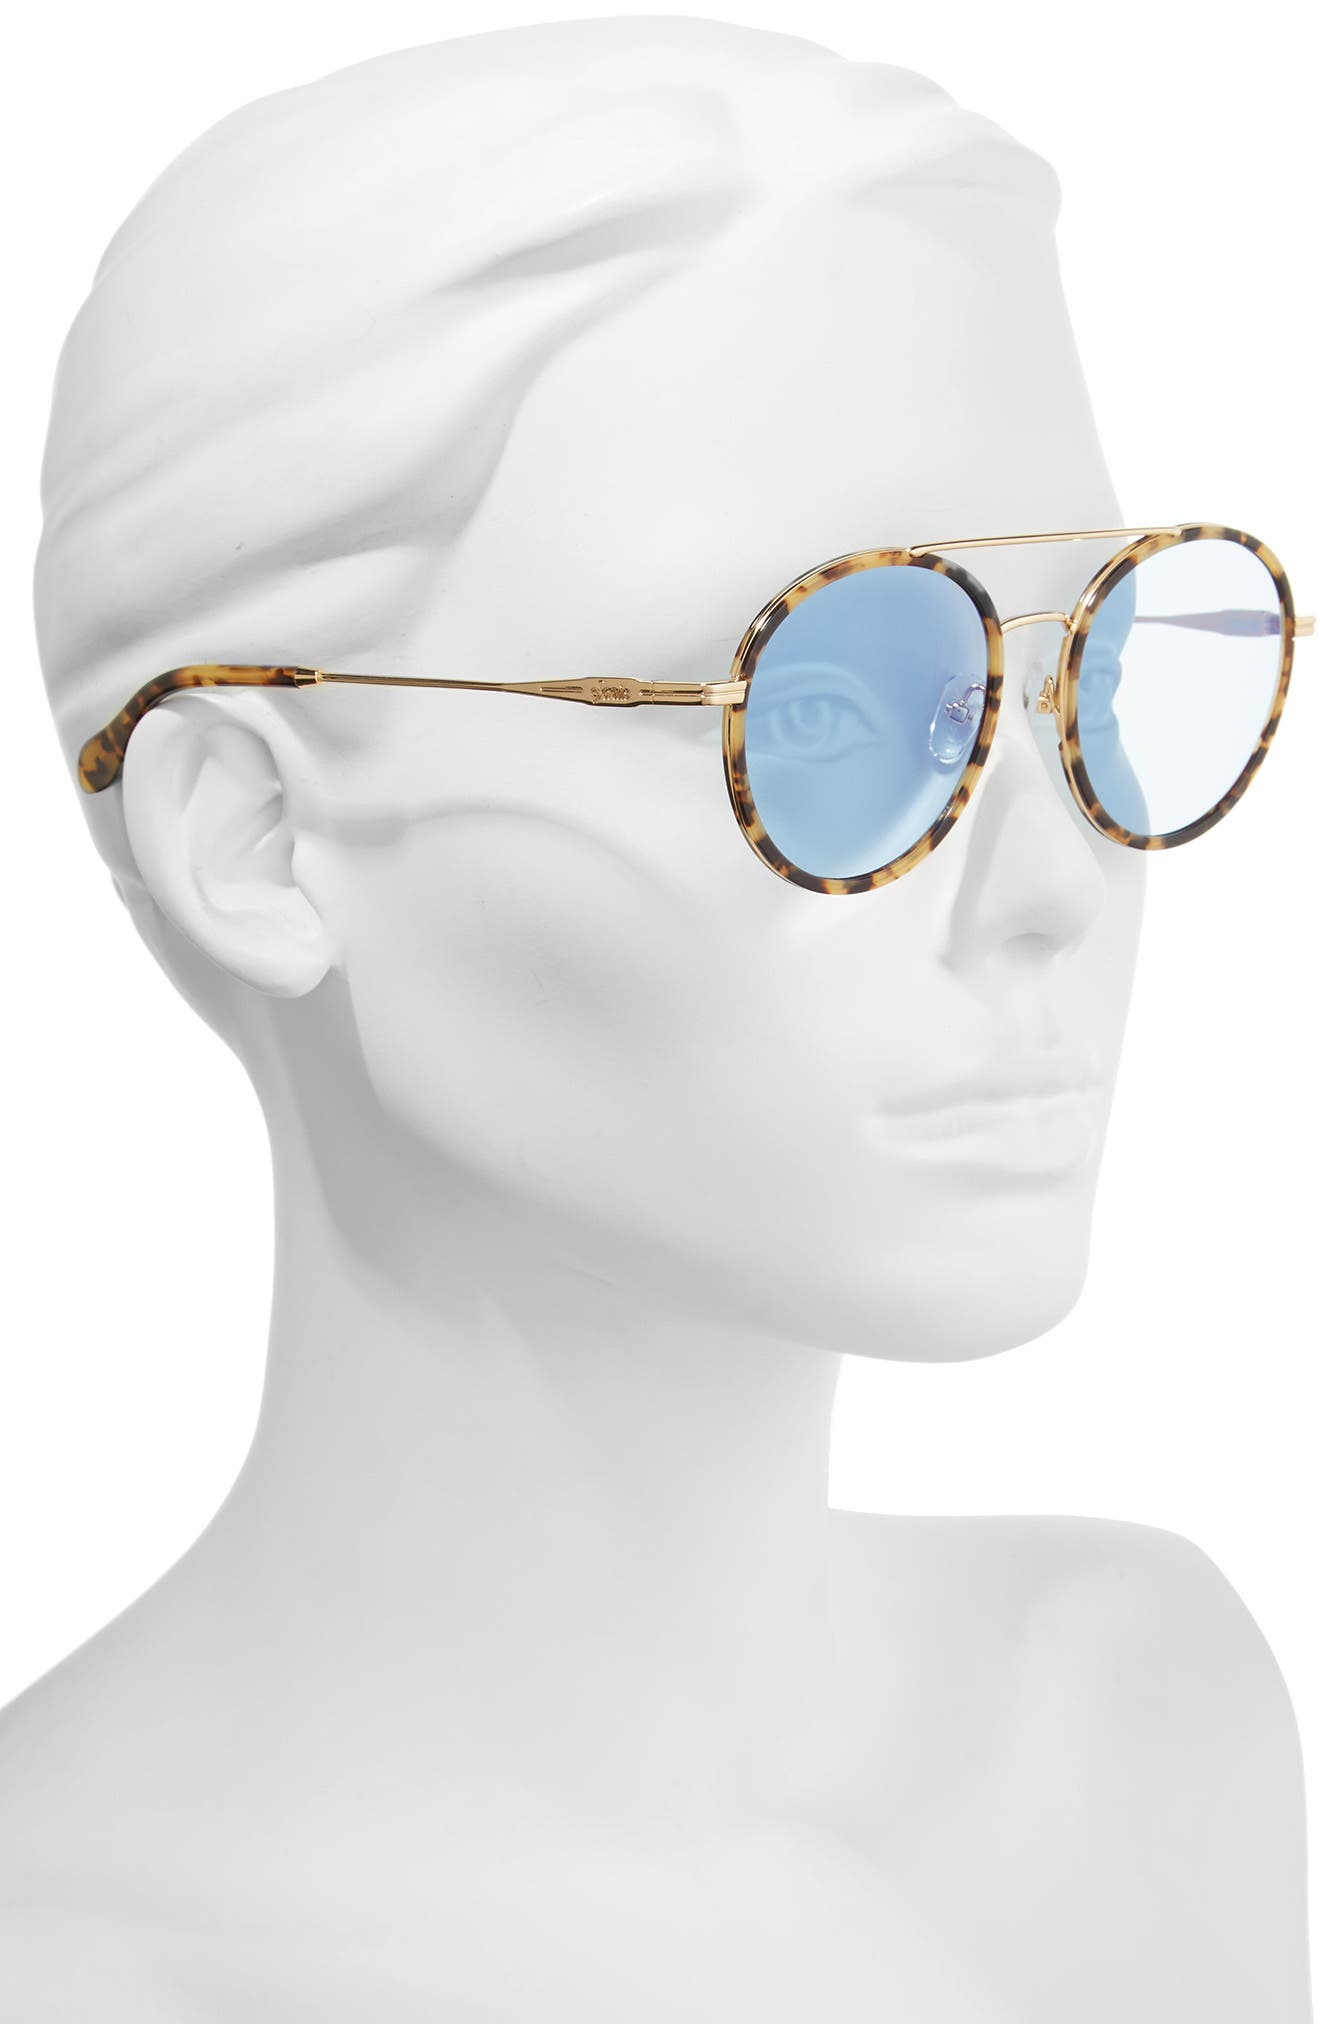 Charli 50mm Mirrored Lens Round Sunglasses,                             Alternate thumbnail 2, color,                             Brown Tortoise/ Powder Mirror